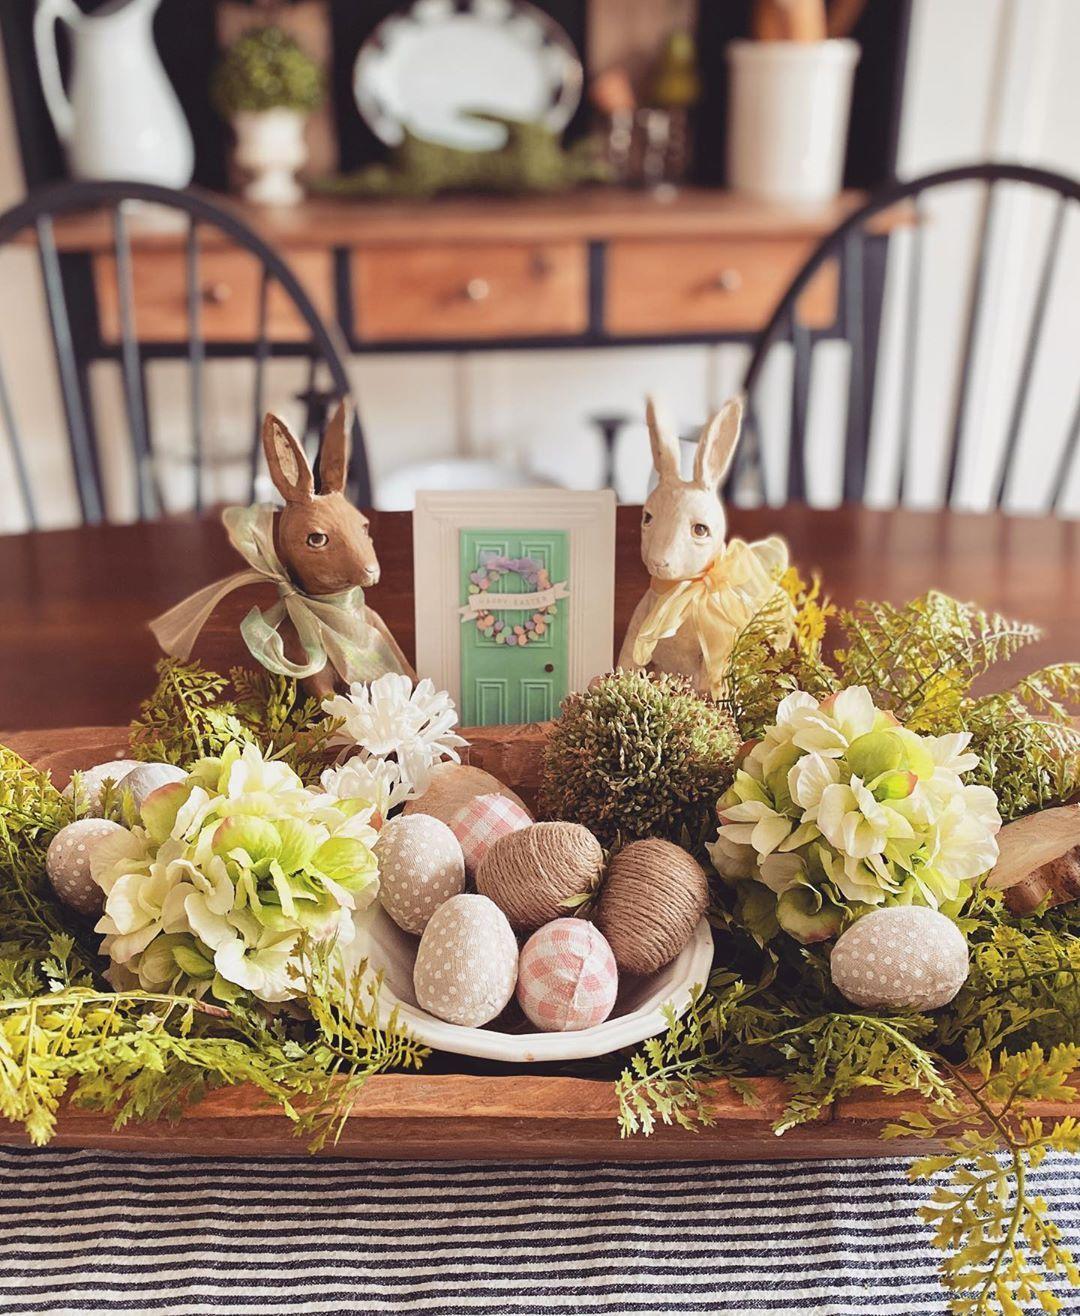 "Kate on Instagram: ""Happy Groundhog Day...I mean Easter 🐰 🐣🌷🌱🌼🐦😷🙏🏻🌿 . . . . . . . #easter2020  #happyeaster2020  #doughbowl  #doughbowllove  #diningtabledecor…"""